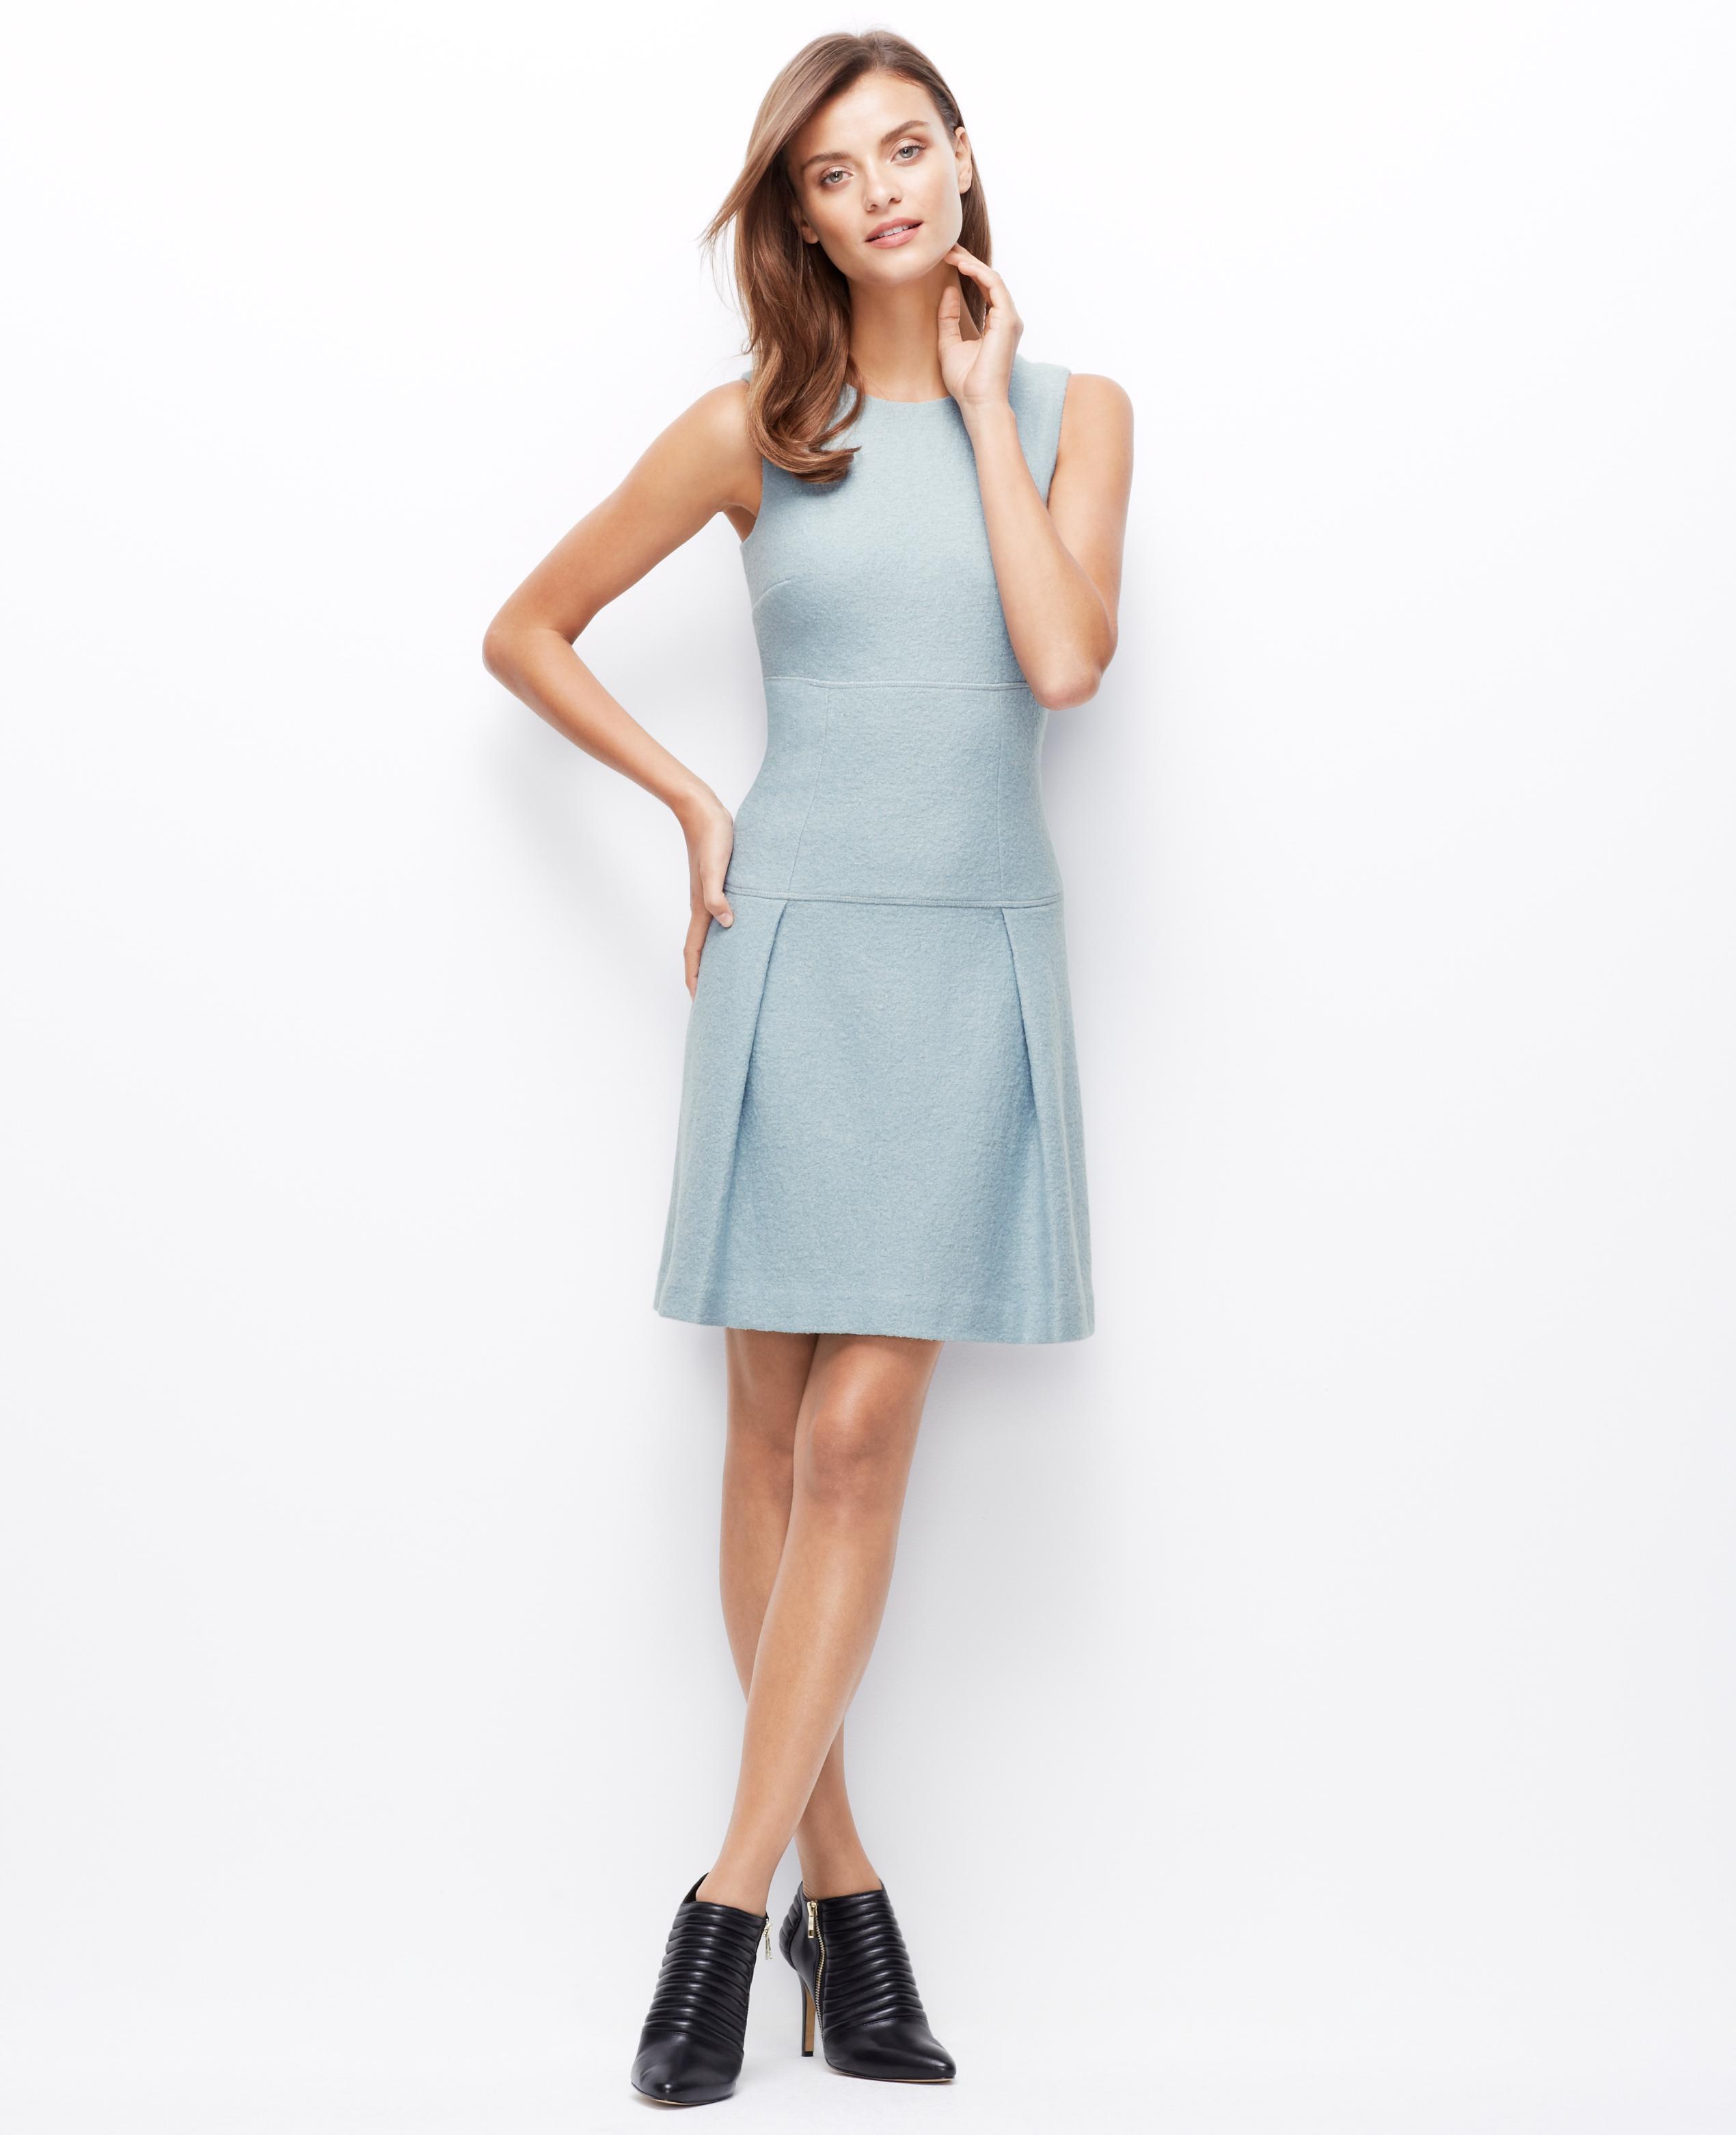 b04f96c1ea Lyst - Ann Taylor Boiled Wool Drop Waist Dress in Blue